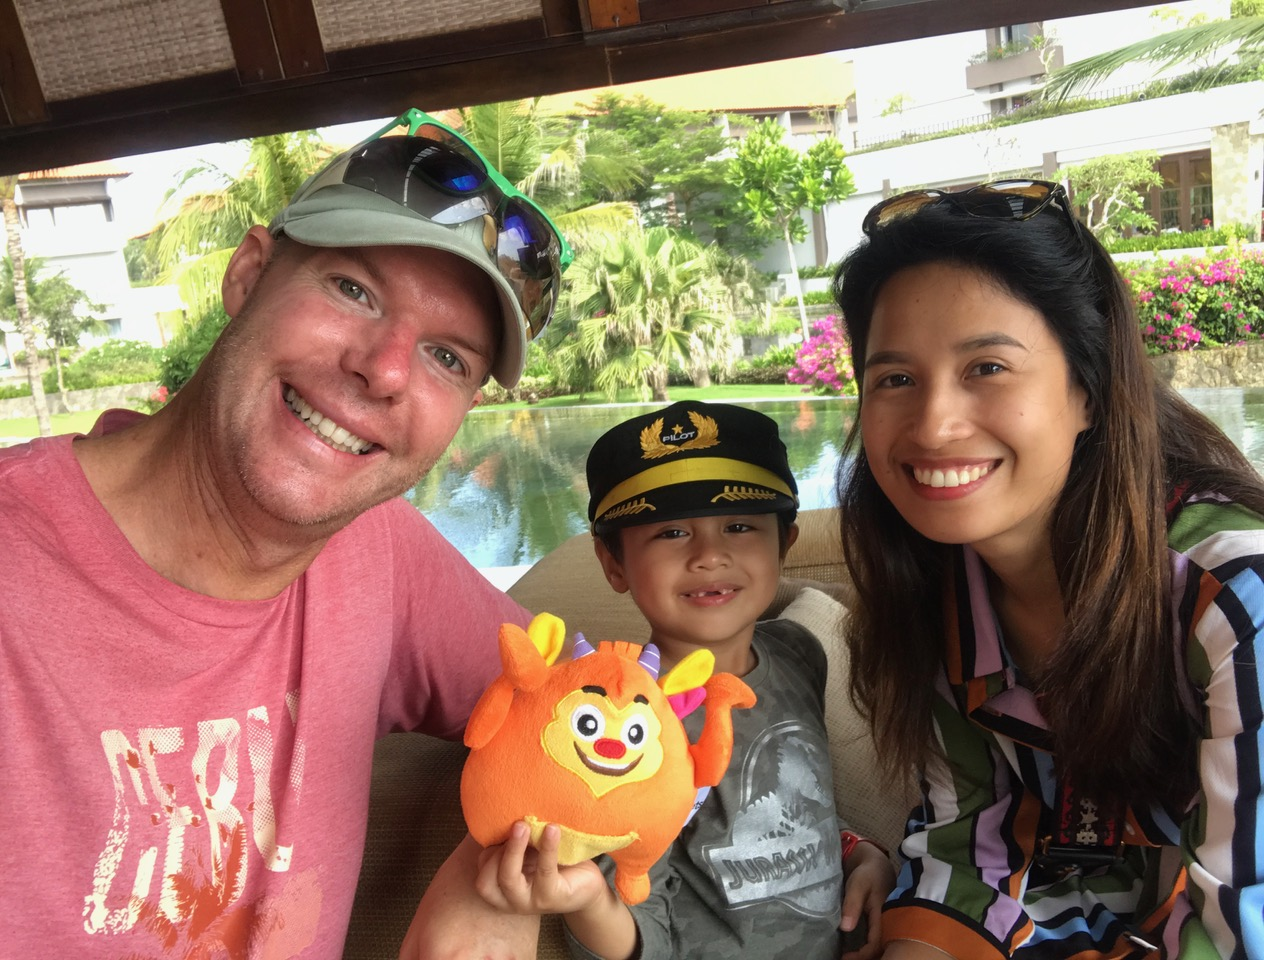 Despite COVID-19 (Coronavirus), this family made it to Australia